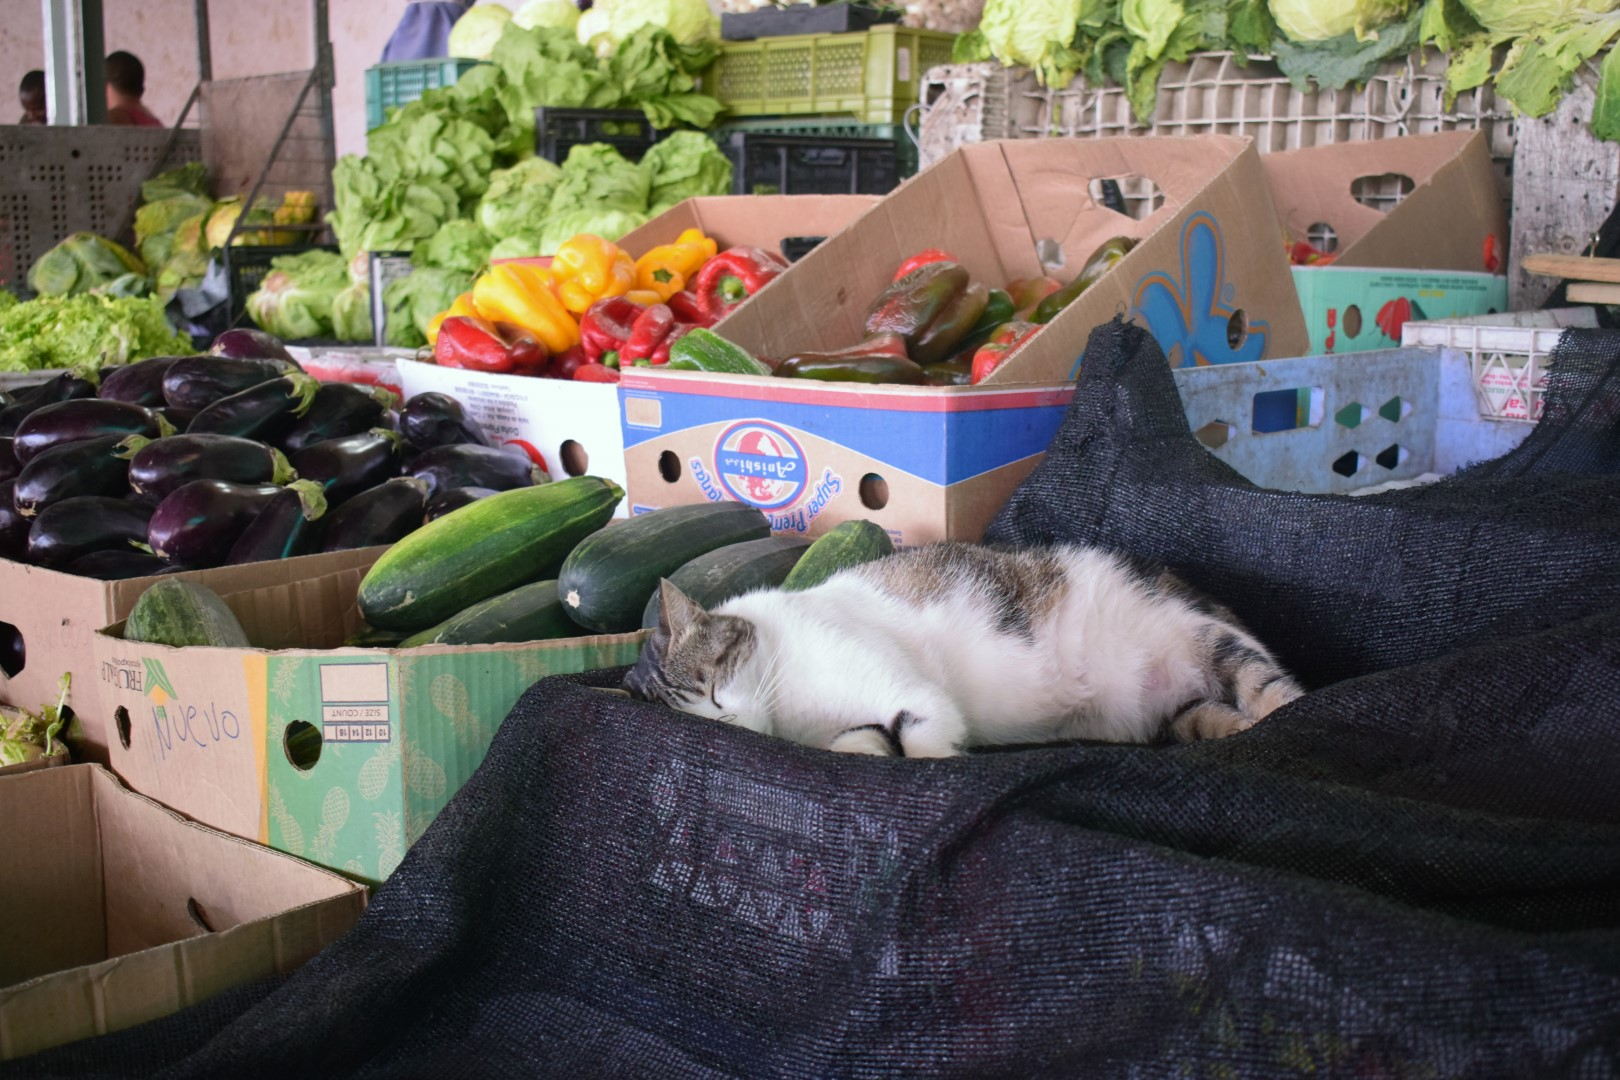 Vega Central de Santiago, the market home to dozens of cats and dogs